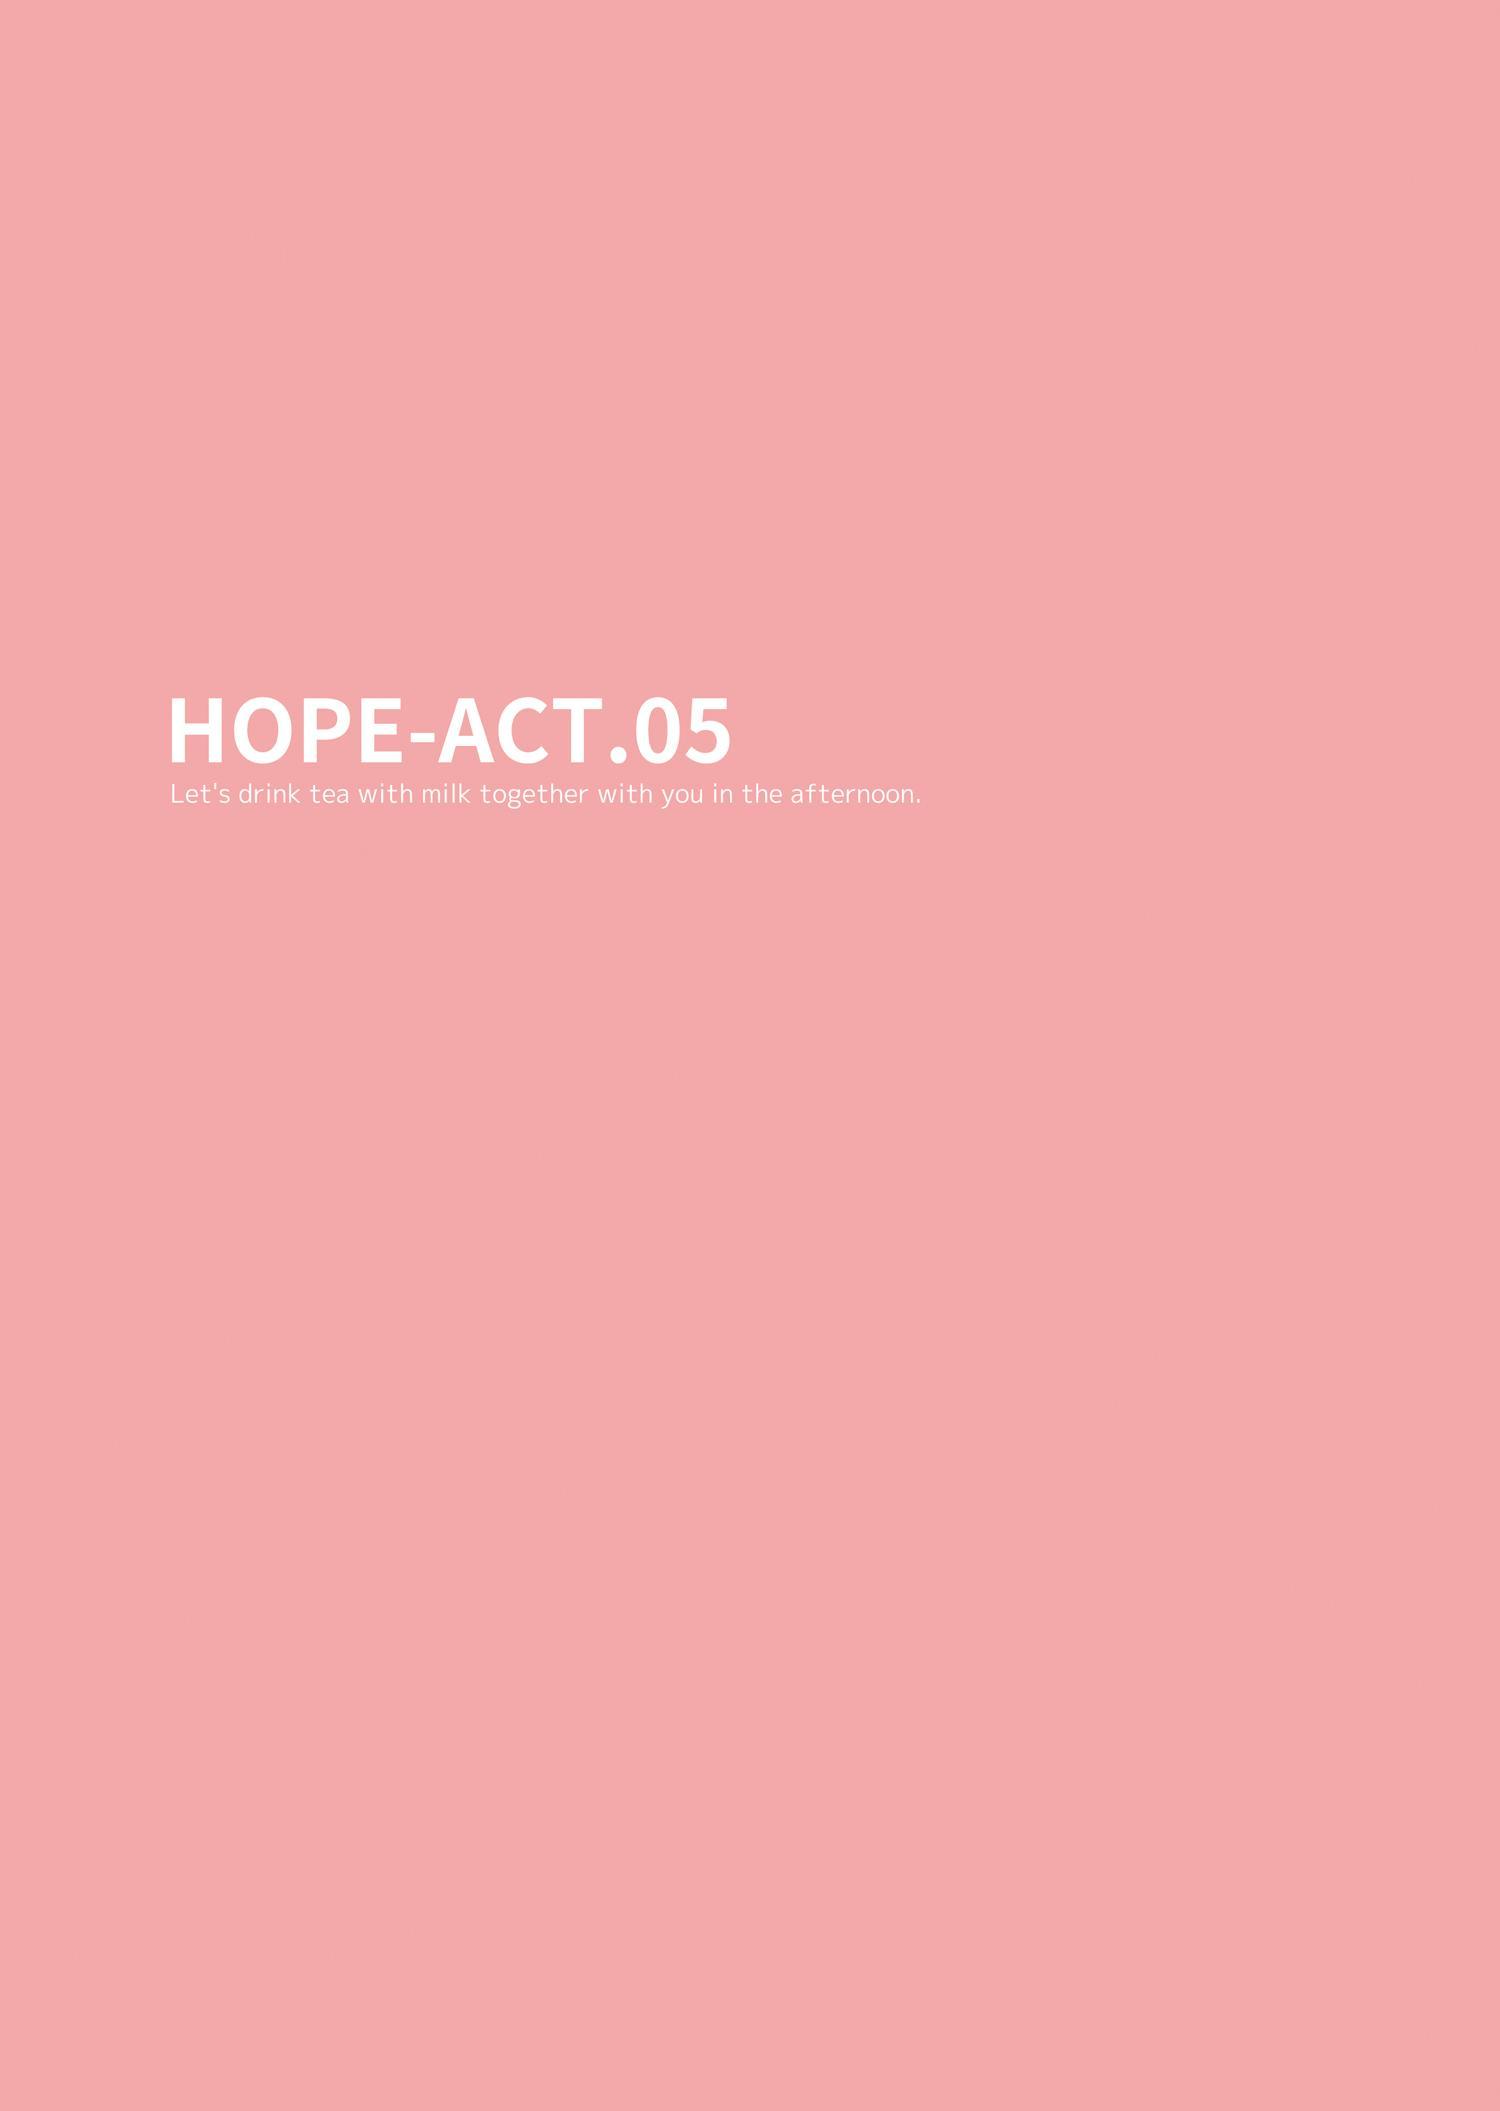 HOPE-ACT. 05 1